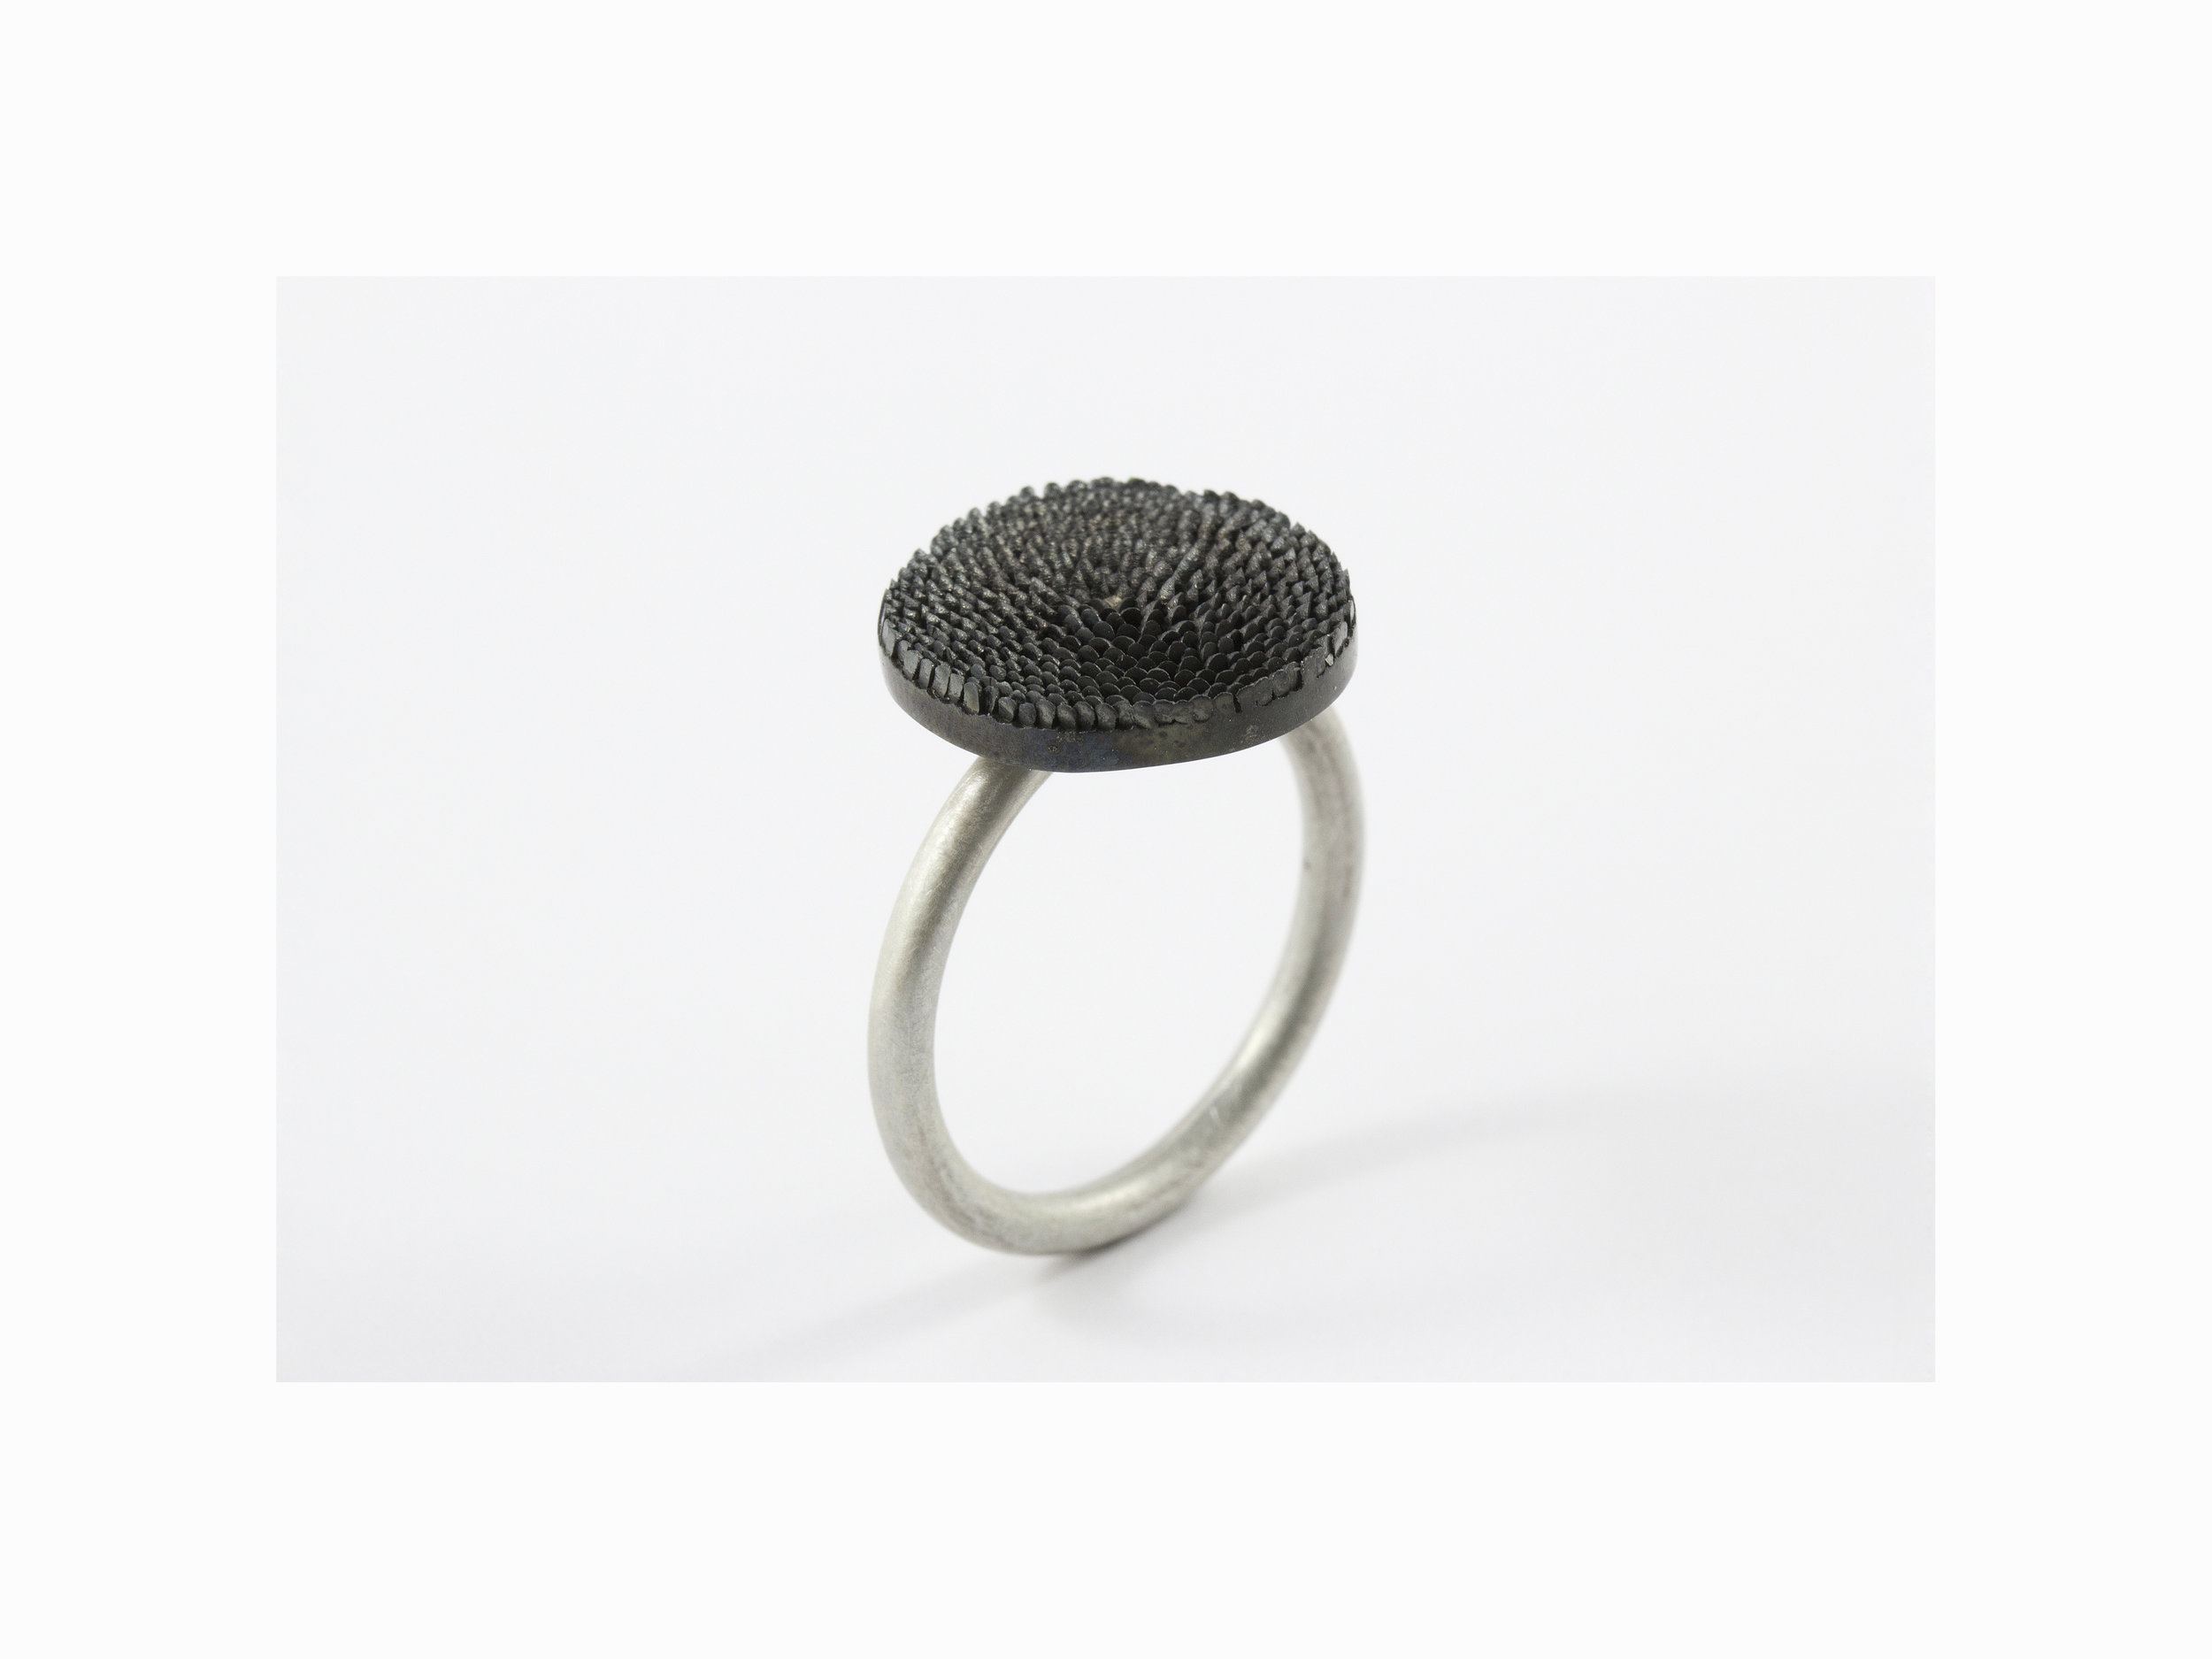 Iron+Ring+(black).jpg